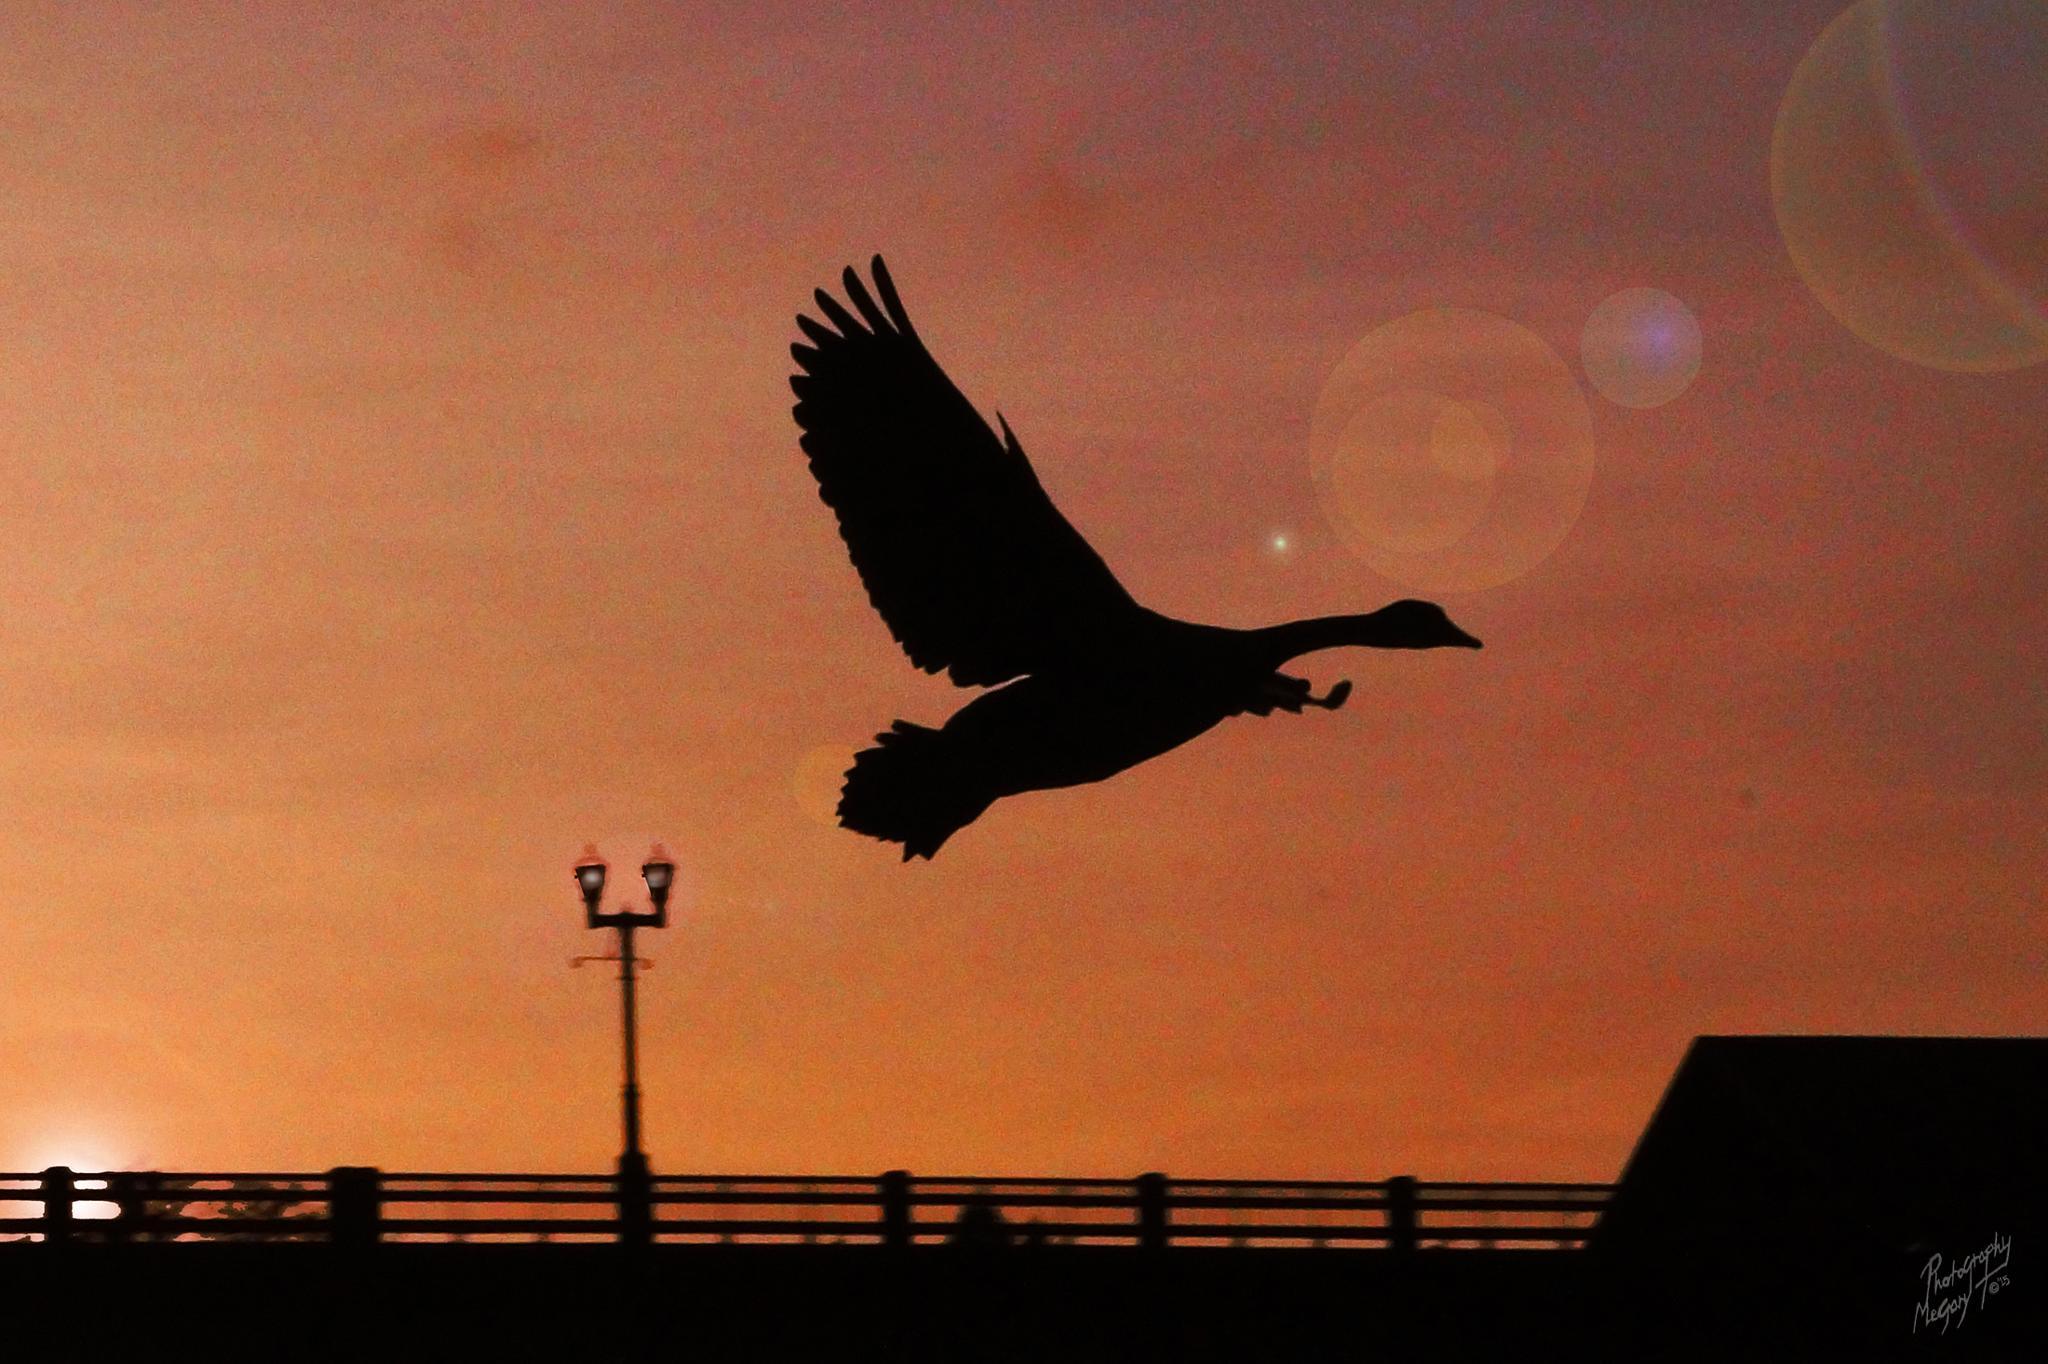 Sunset Goose by MegaryT [[°©;]